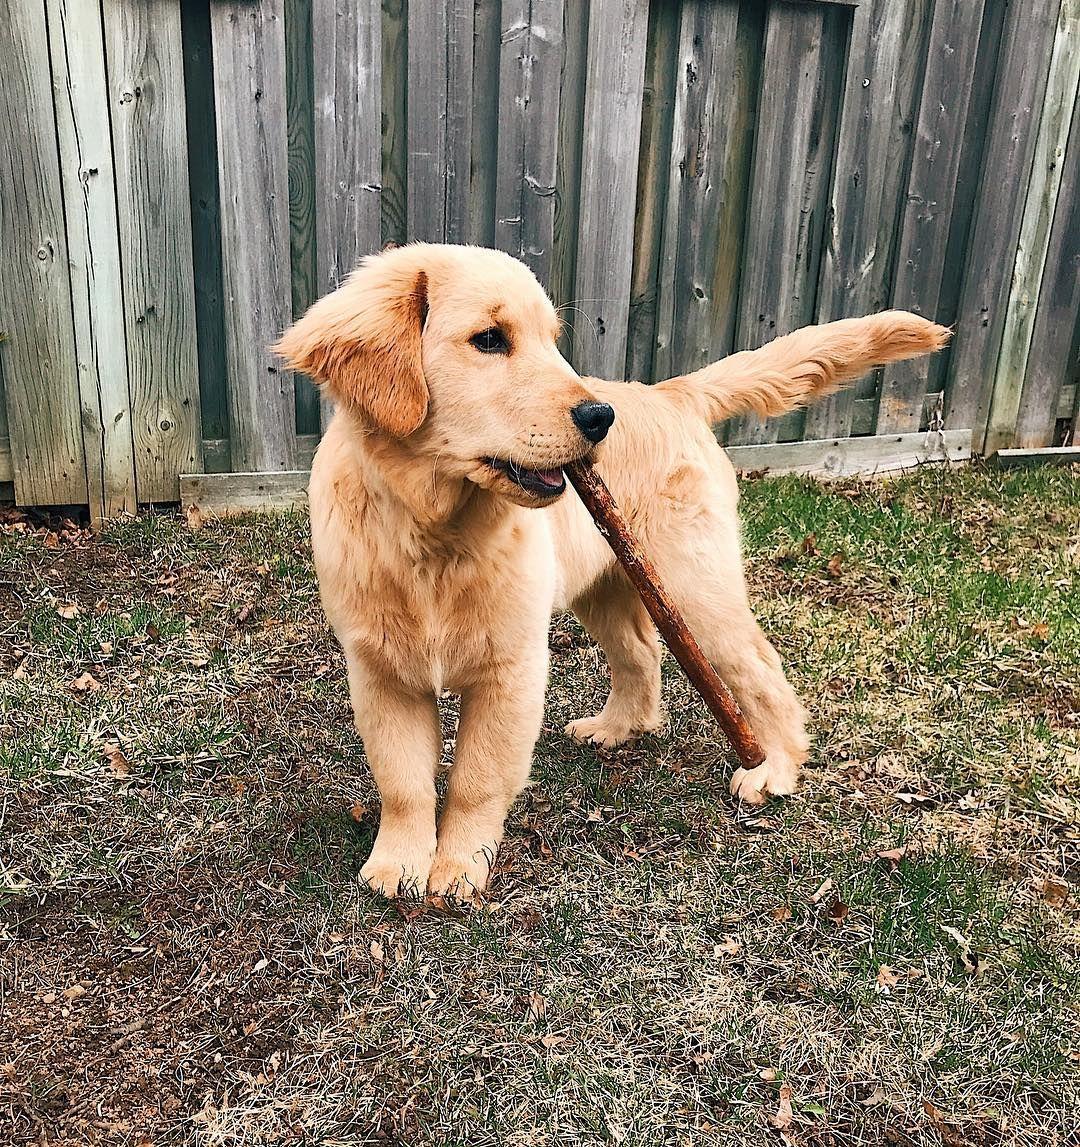 Hudson Dogs Golden Retriever Baby Dogs